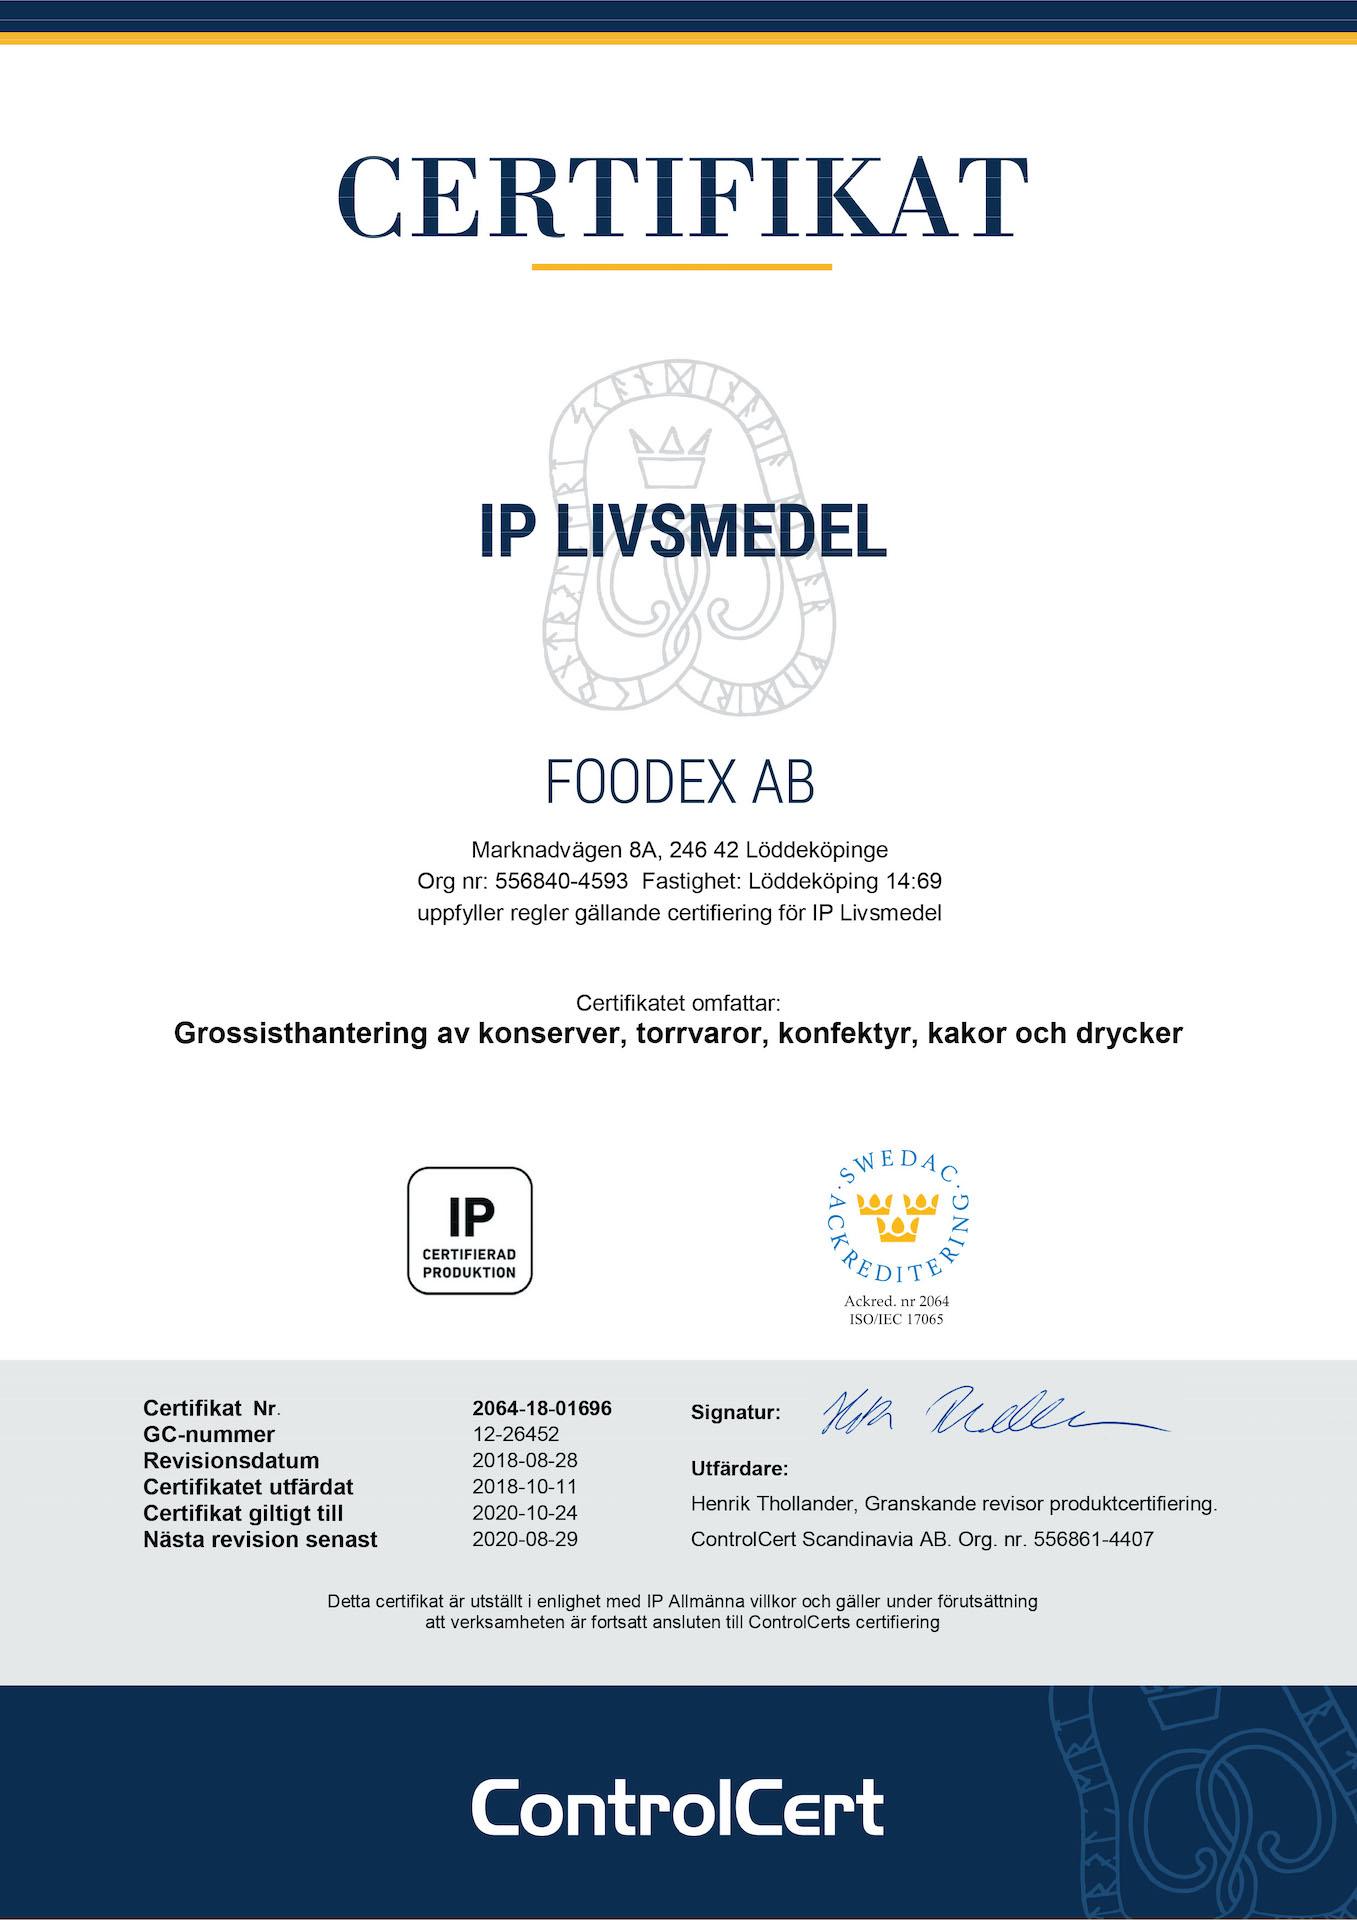 Certifikat IP Livsmedel Foodex AB 2018-10-11